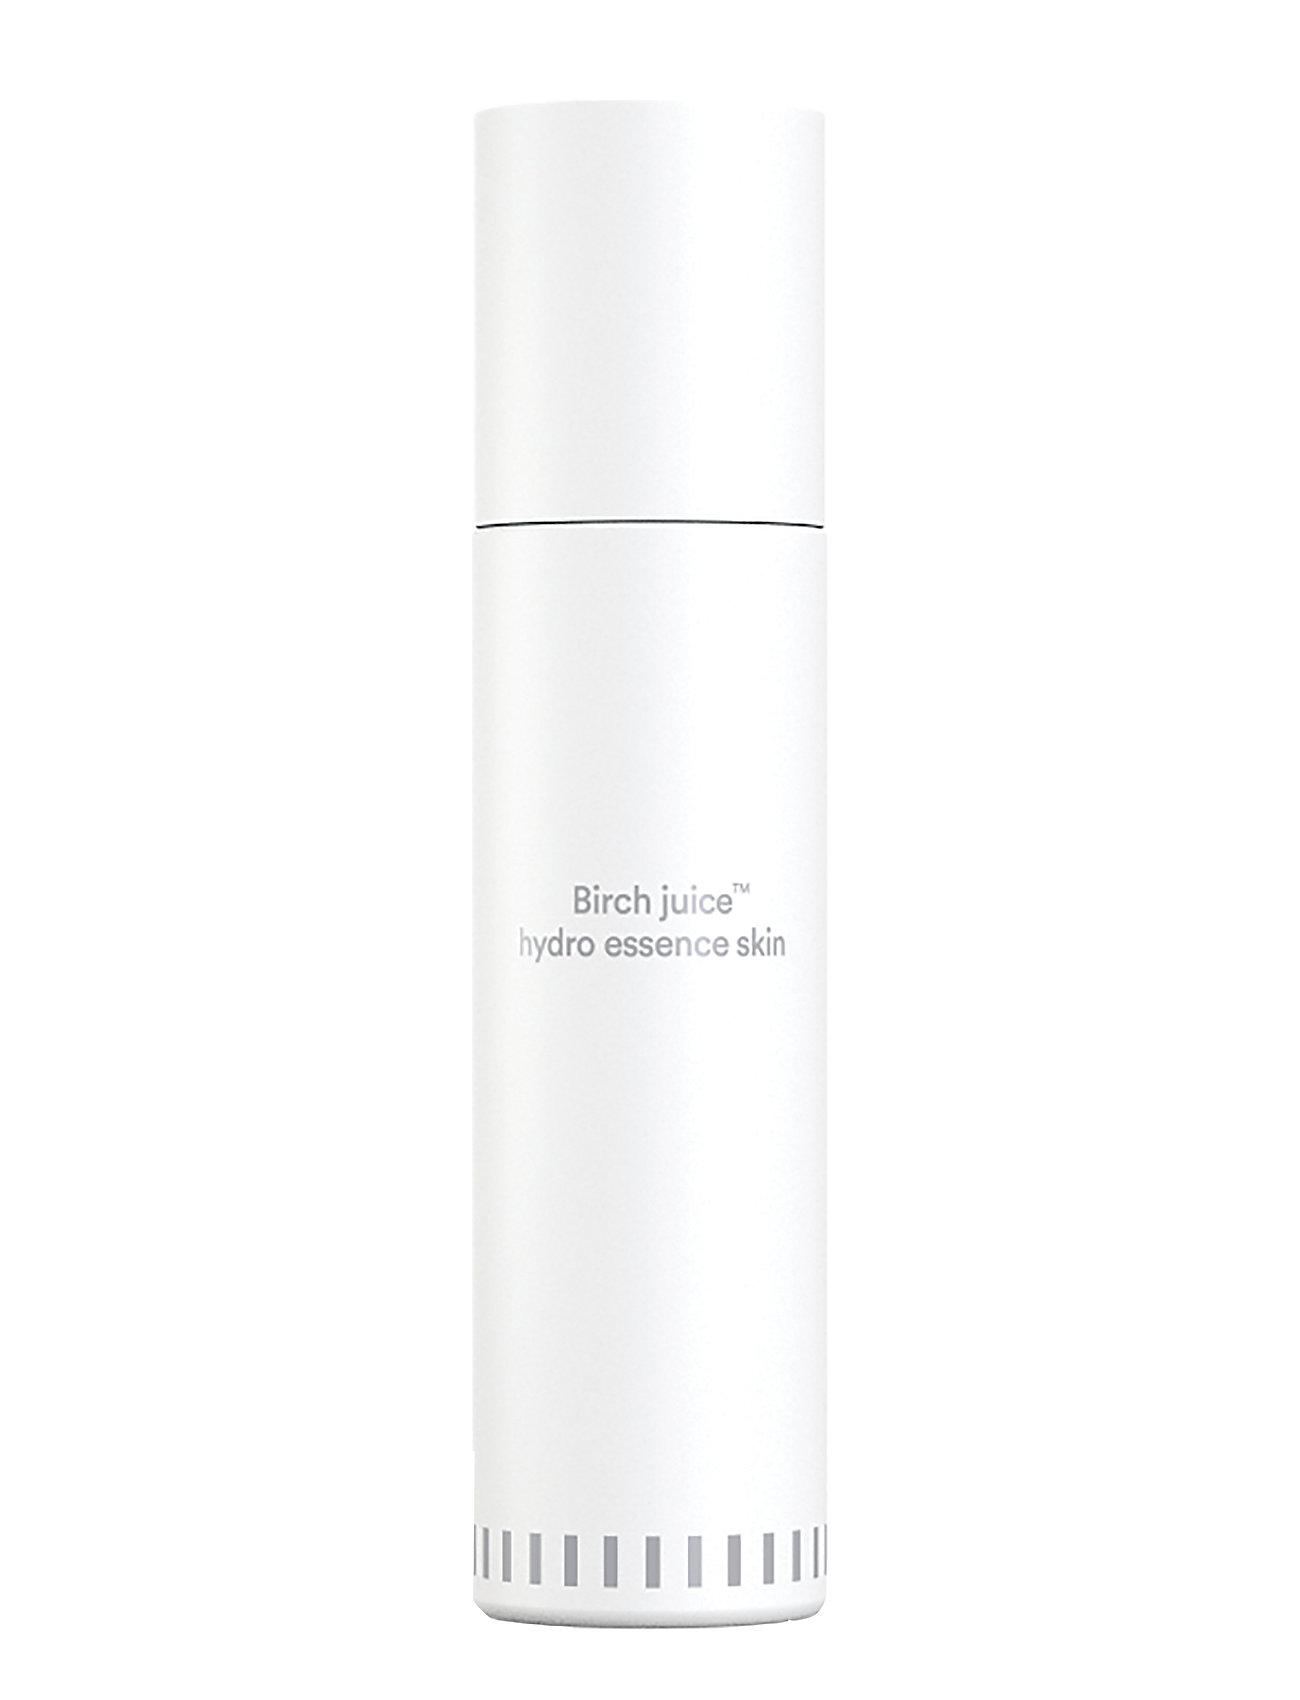 Image of E Nature Birch Juice™ Hydro Essence Skin Serum Ansigtspleje Nude E NATURE (3067546559)